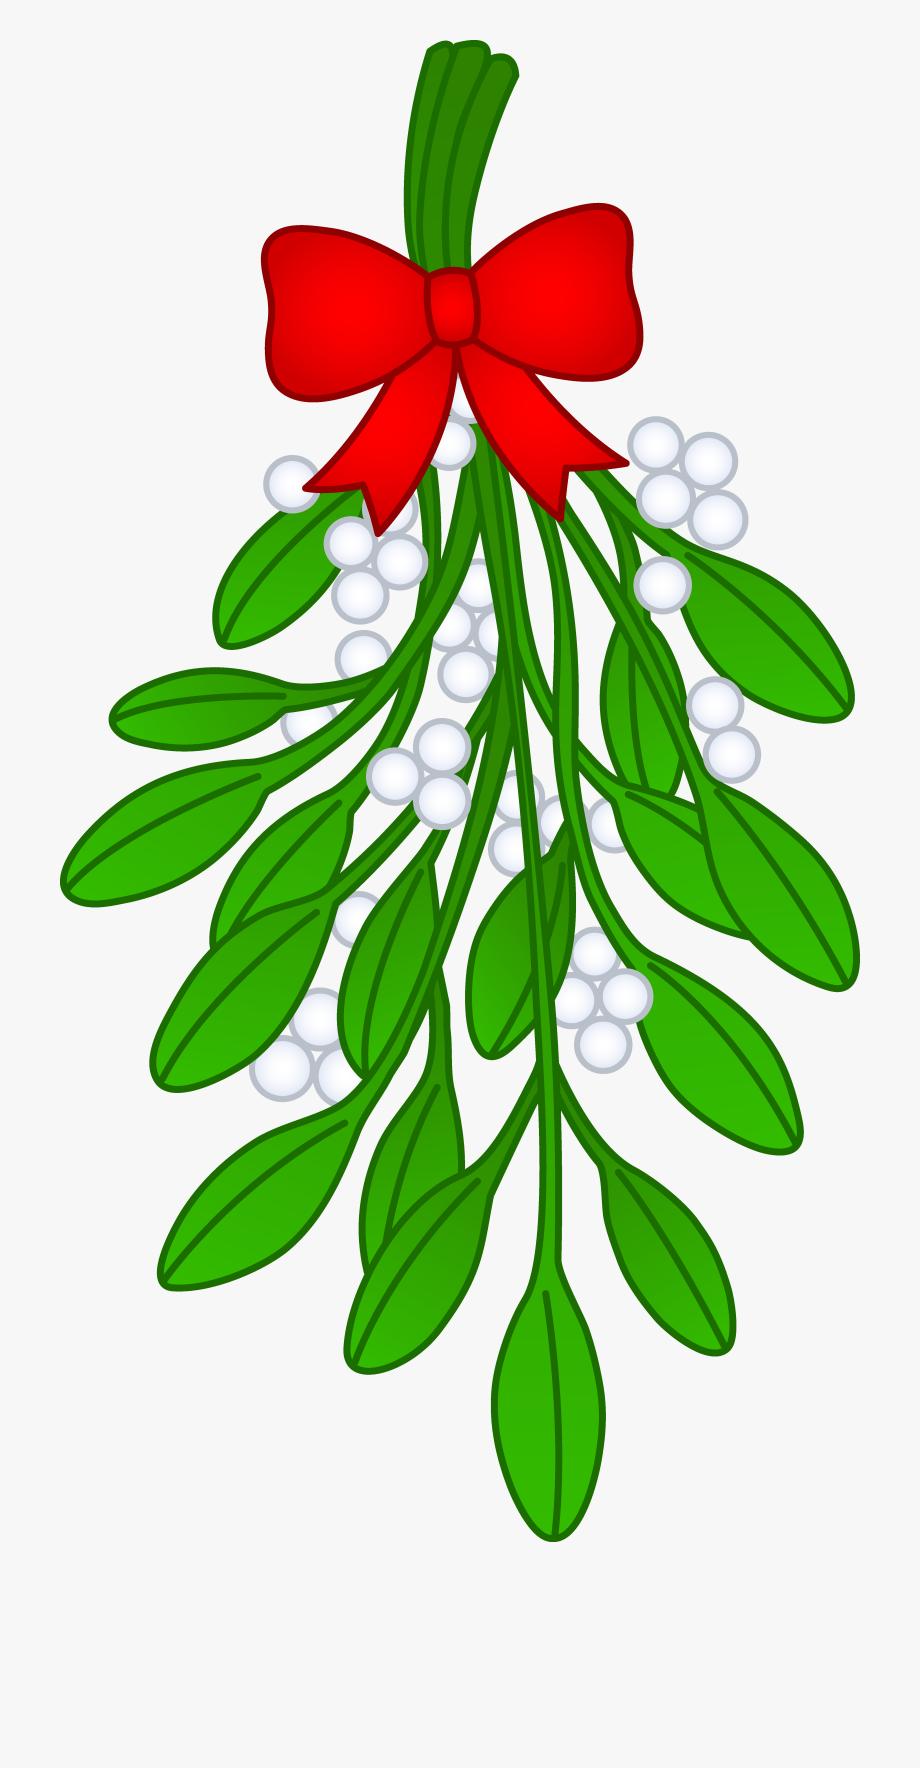 Clipart Mistletoe.